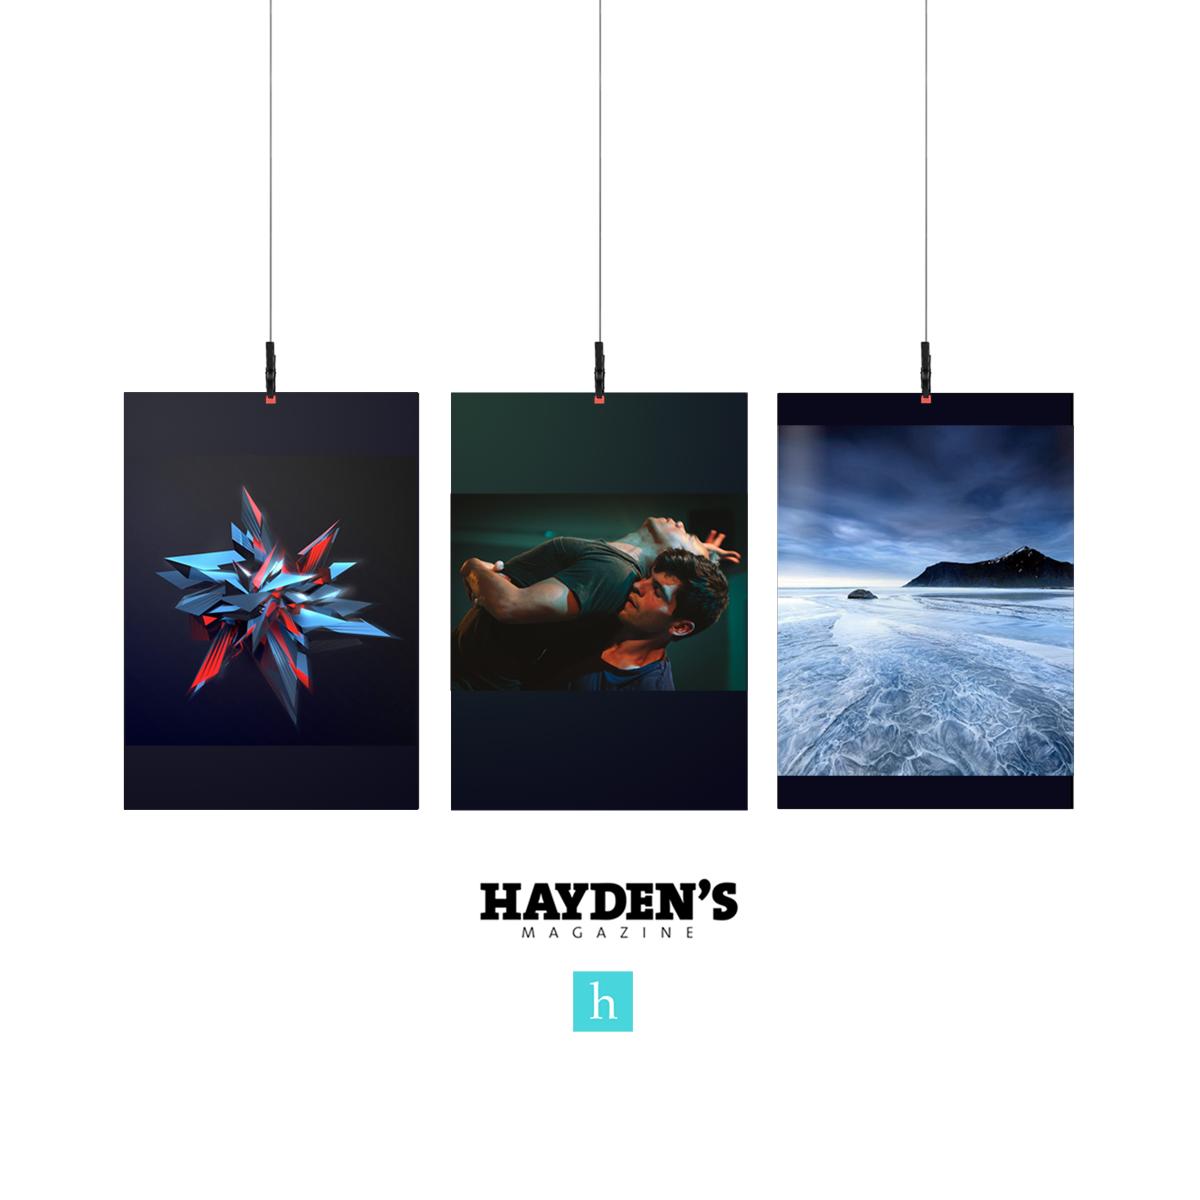 haydensgallery3